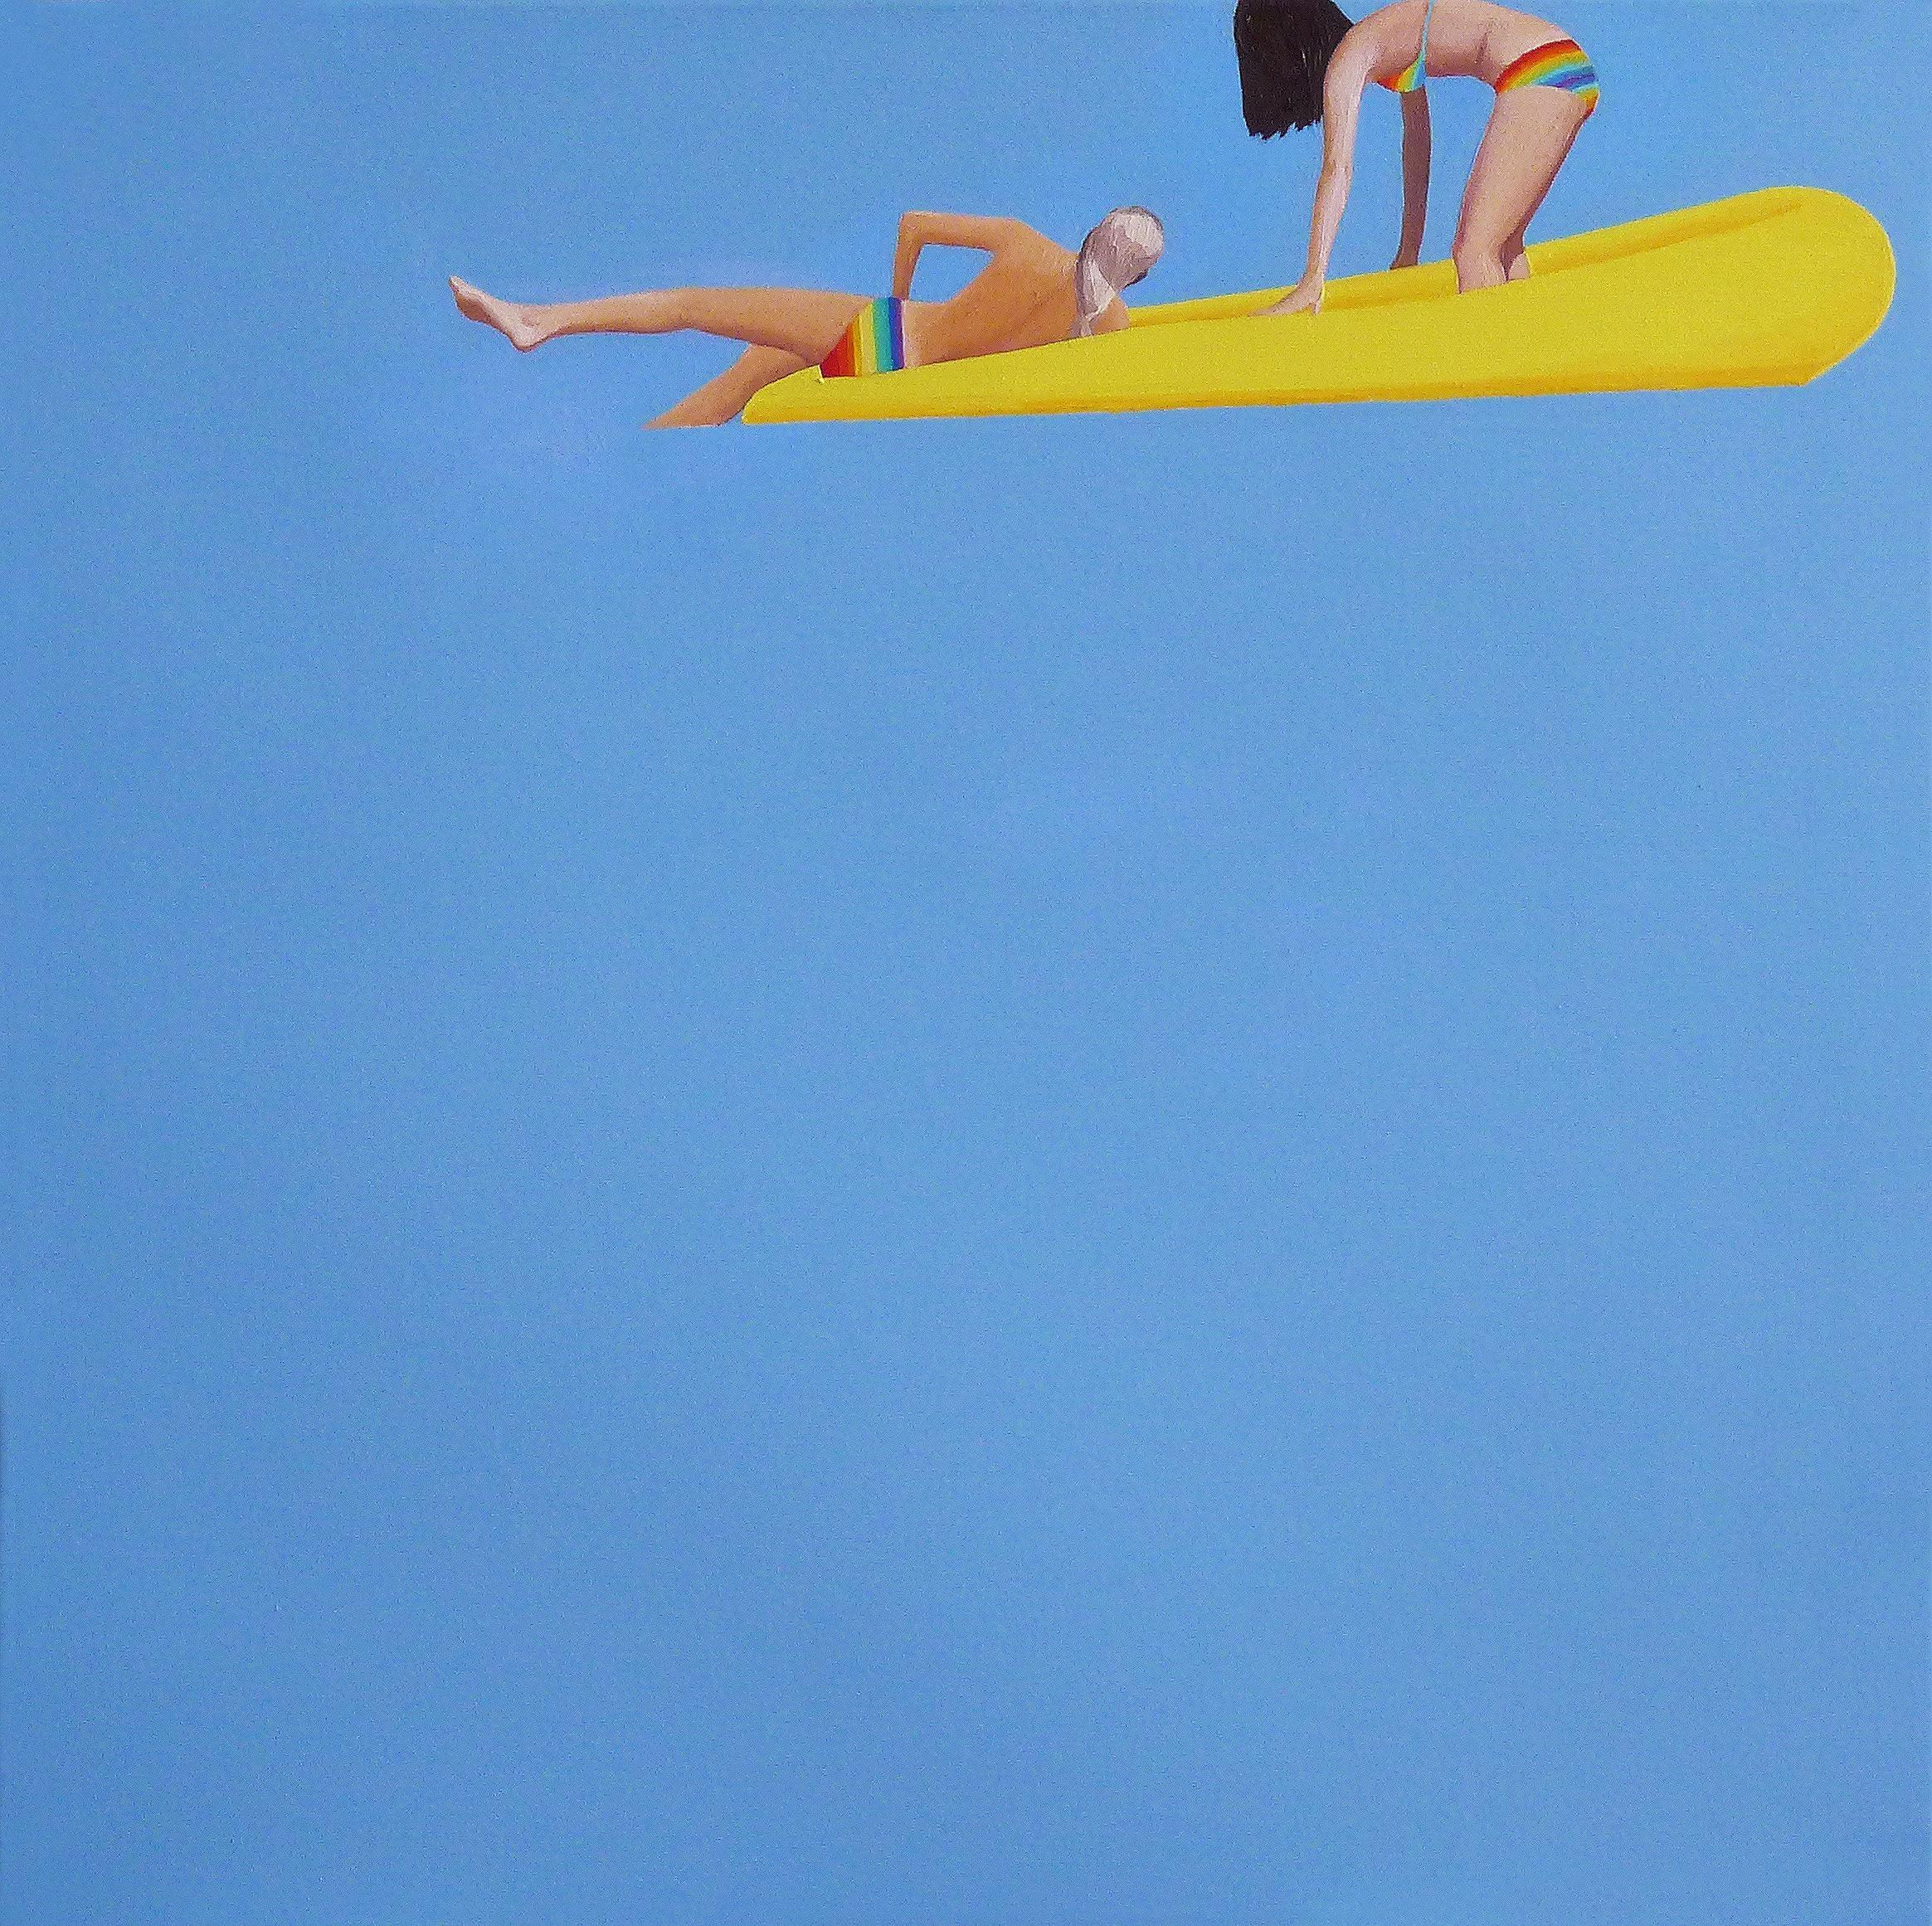 Rainbow - Minimalistic Figurative Oil Painting, Beach View, Realism, Seascape